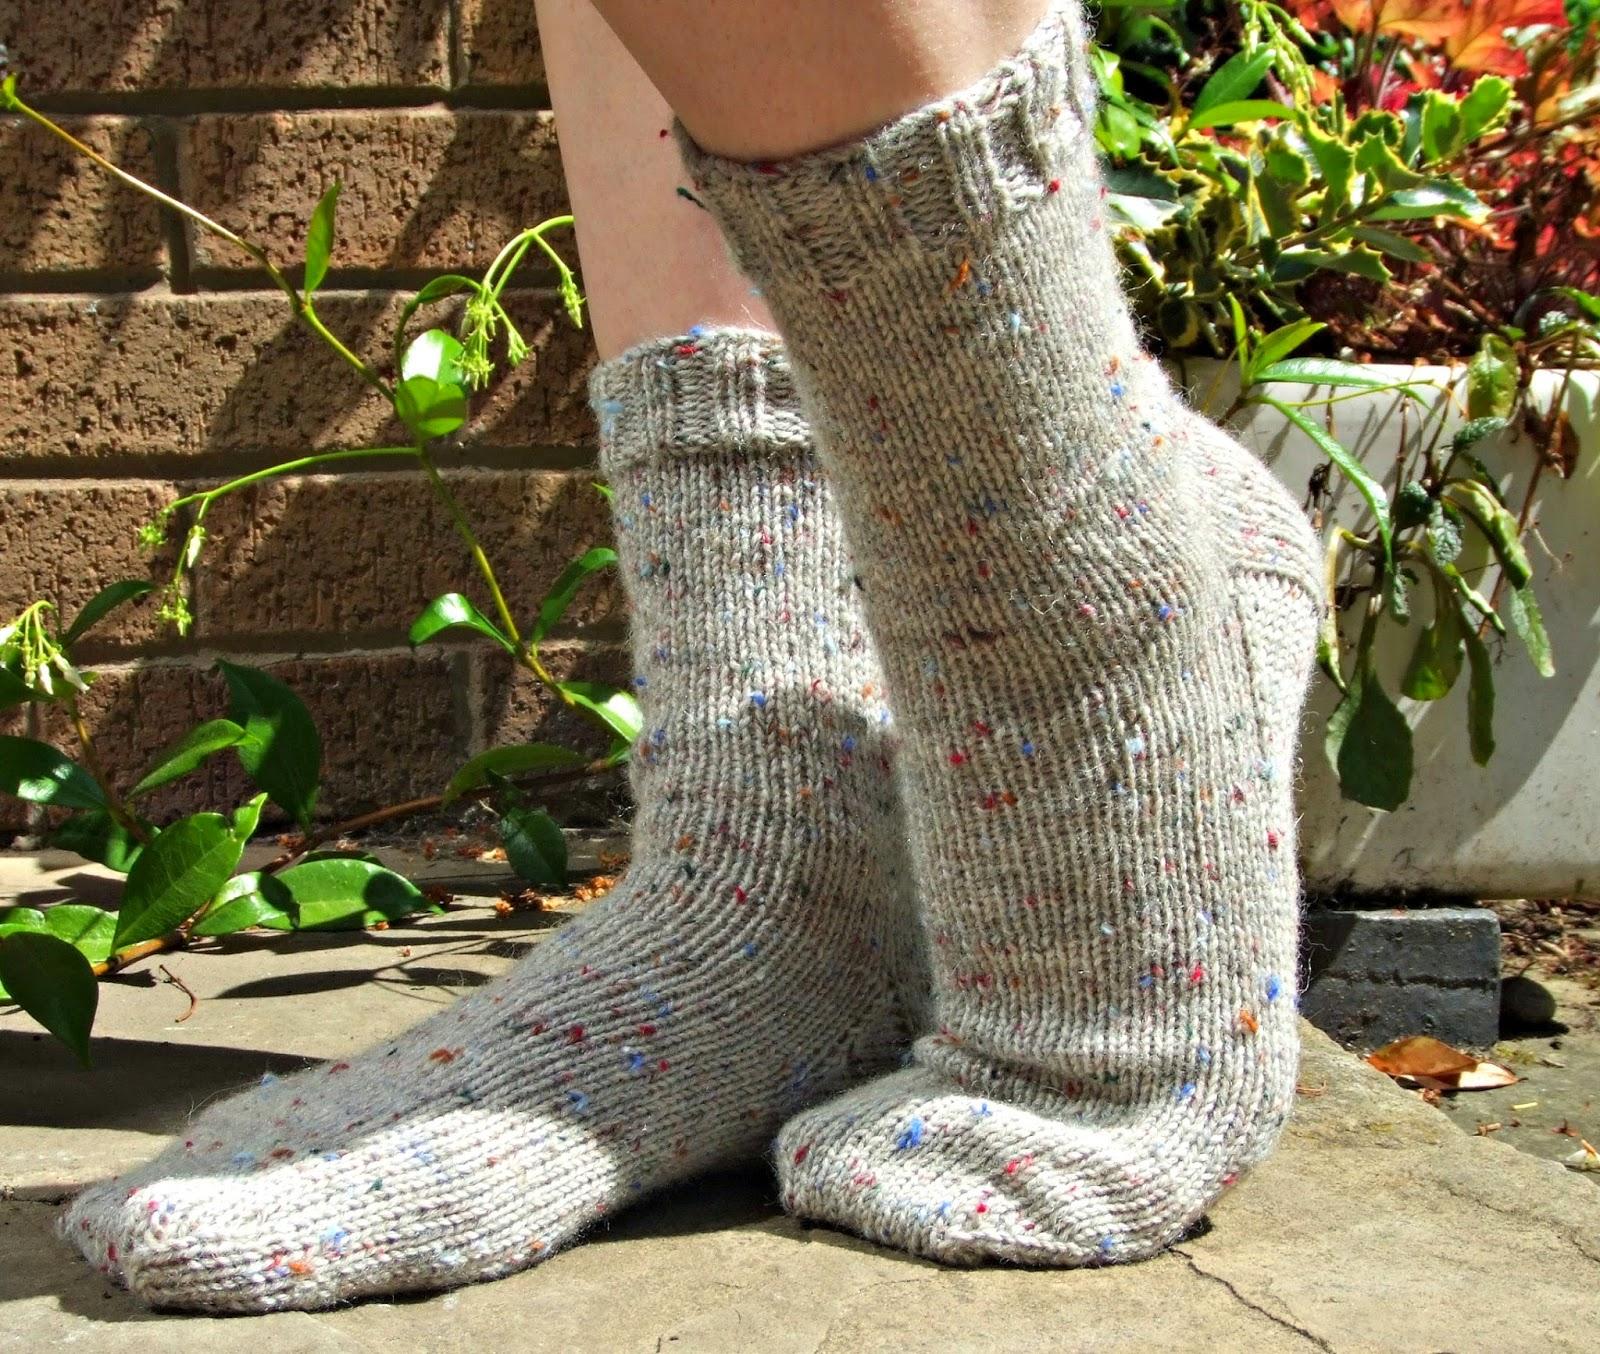 Knitting Pattern For Socks On Five Needles : Winwick Mum: Basic 6ply boot socks - free pattern and tutorial